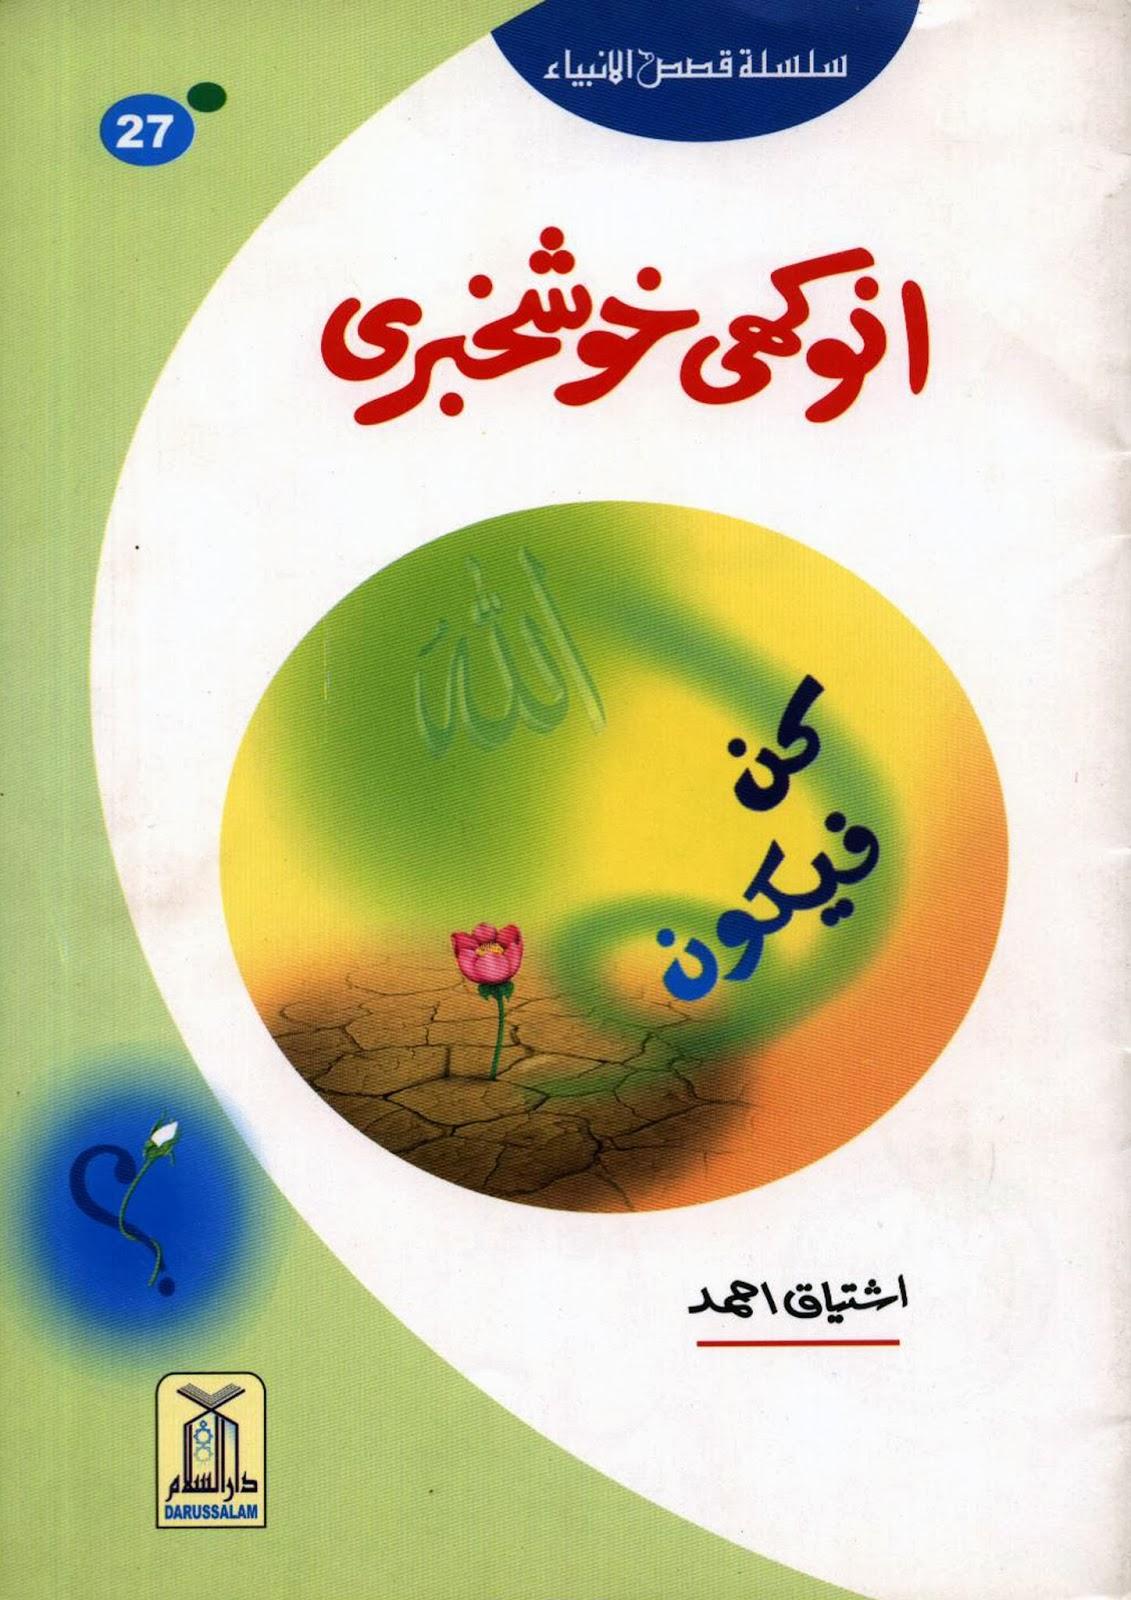 http://urduguru1.blogspot.com/2014/03/aanokhi-khos-khabri-prophet-zakariya-as.html